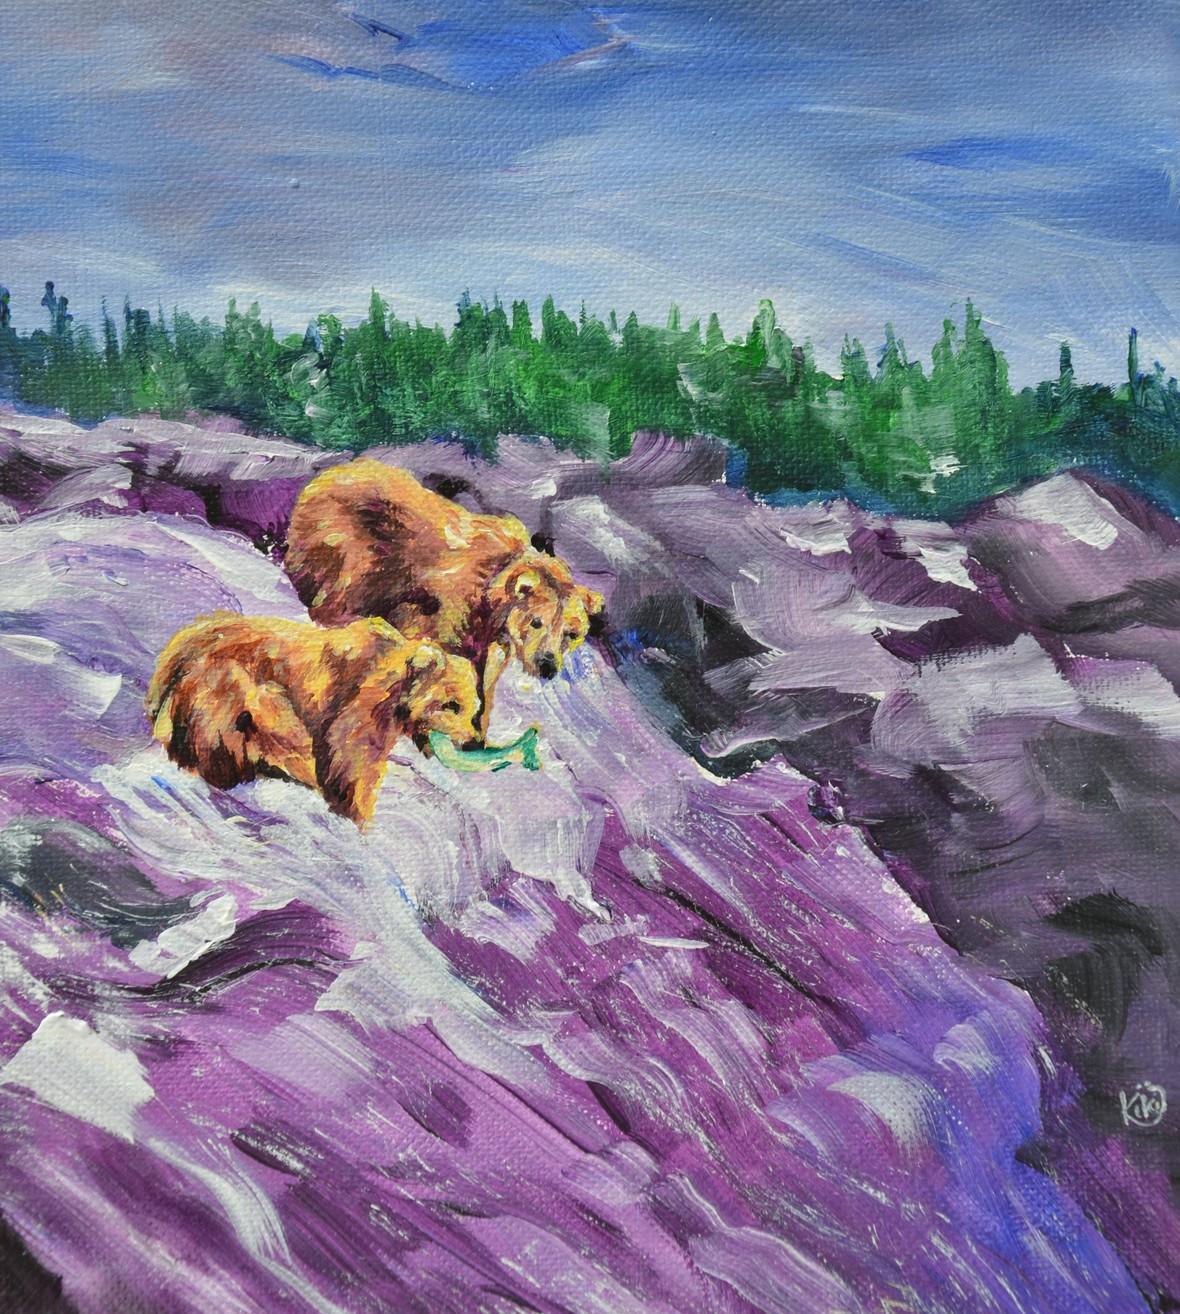 fishing grizzlies